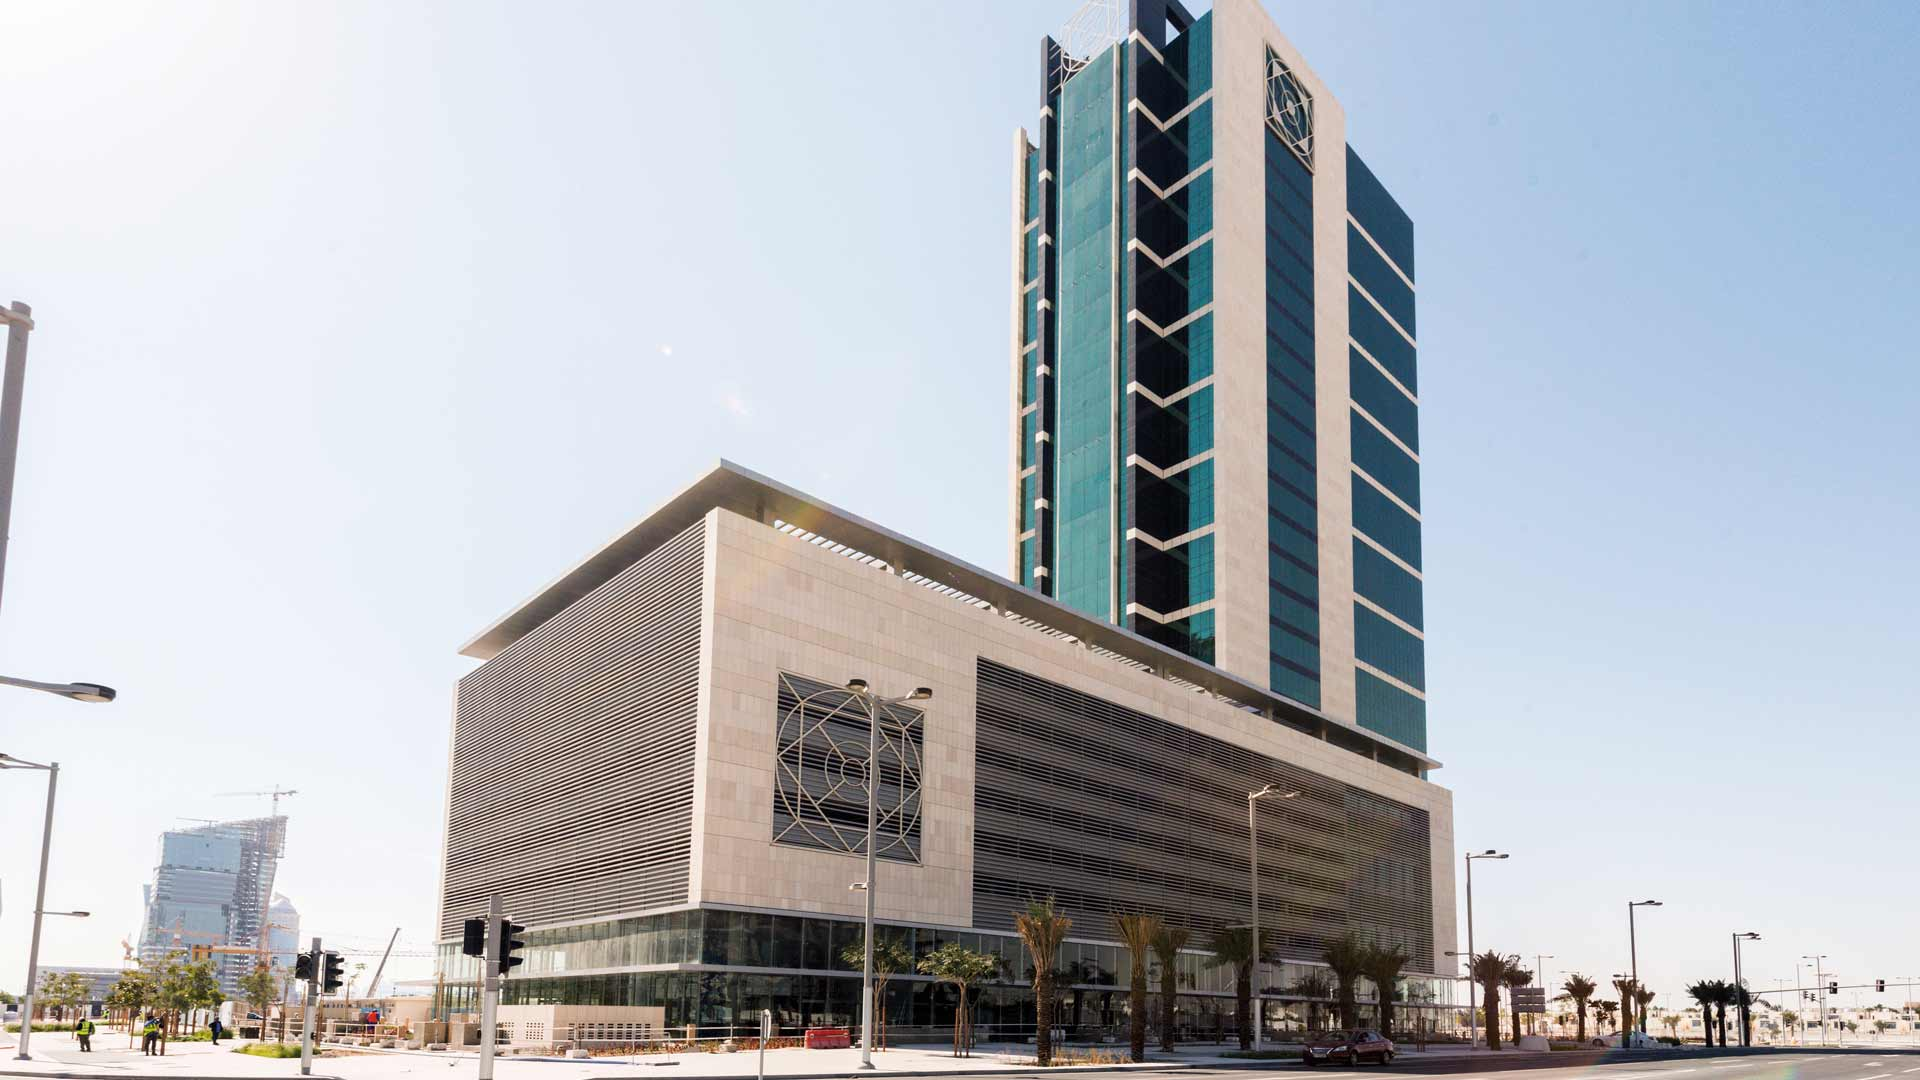 Building in Lusail, Qatar